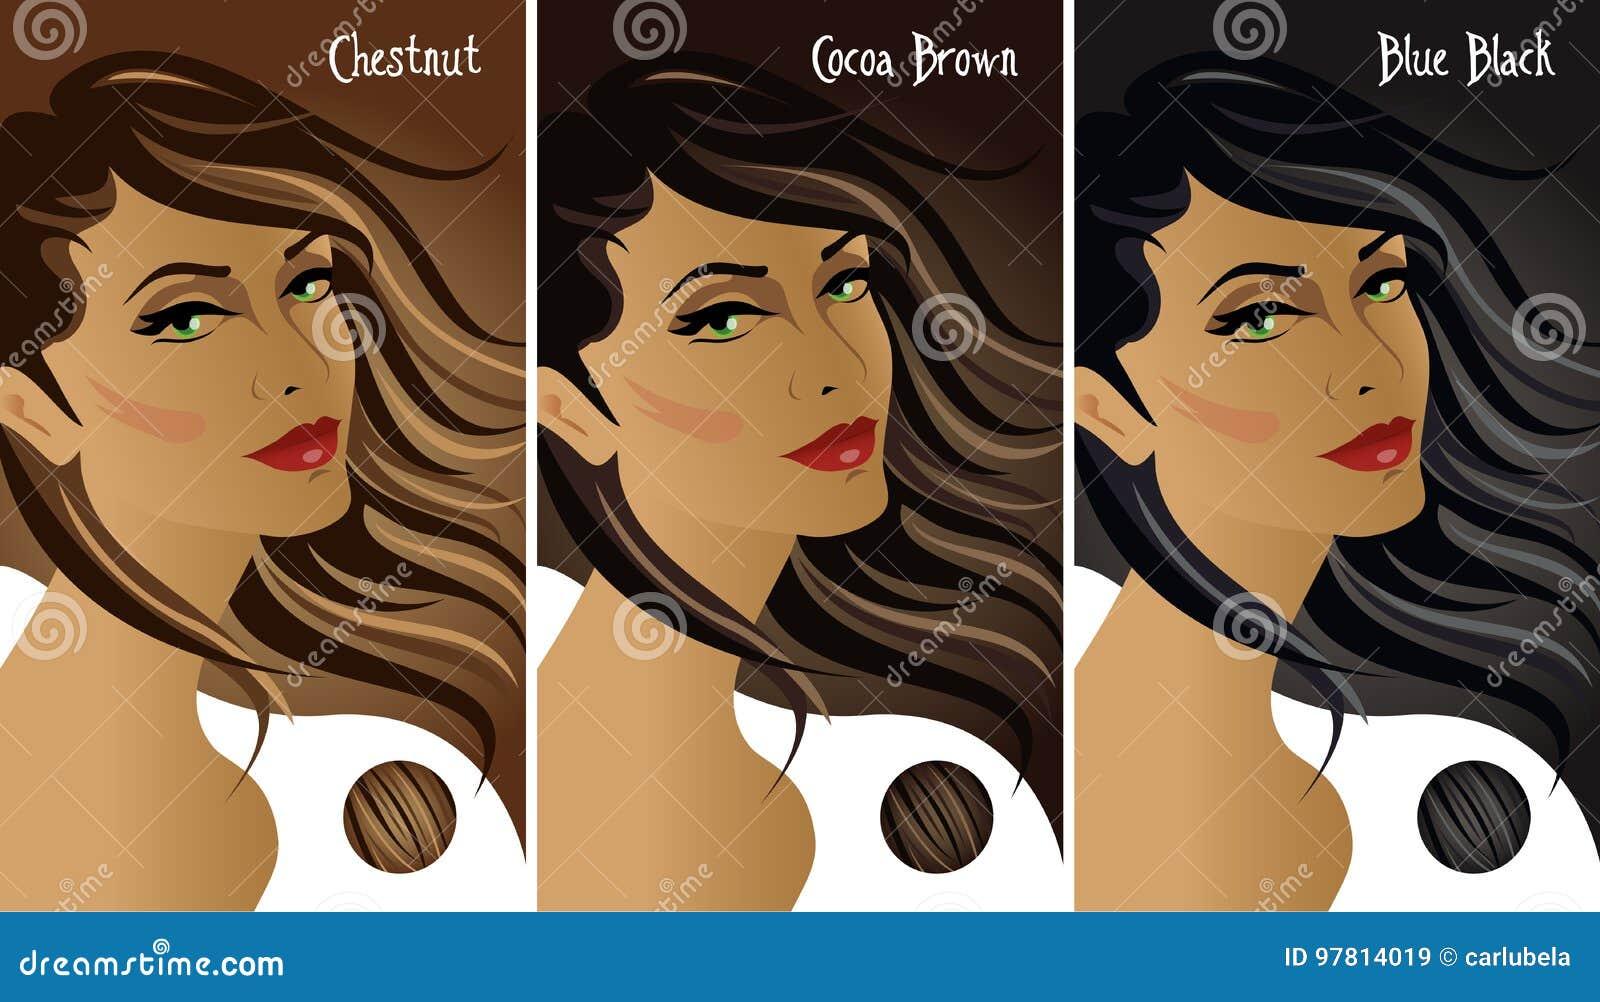 Dark Hair Colors Chart Stock Vector Illustration Of Hair 97814019